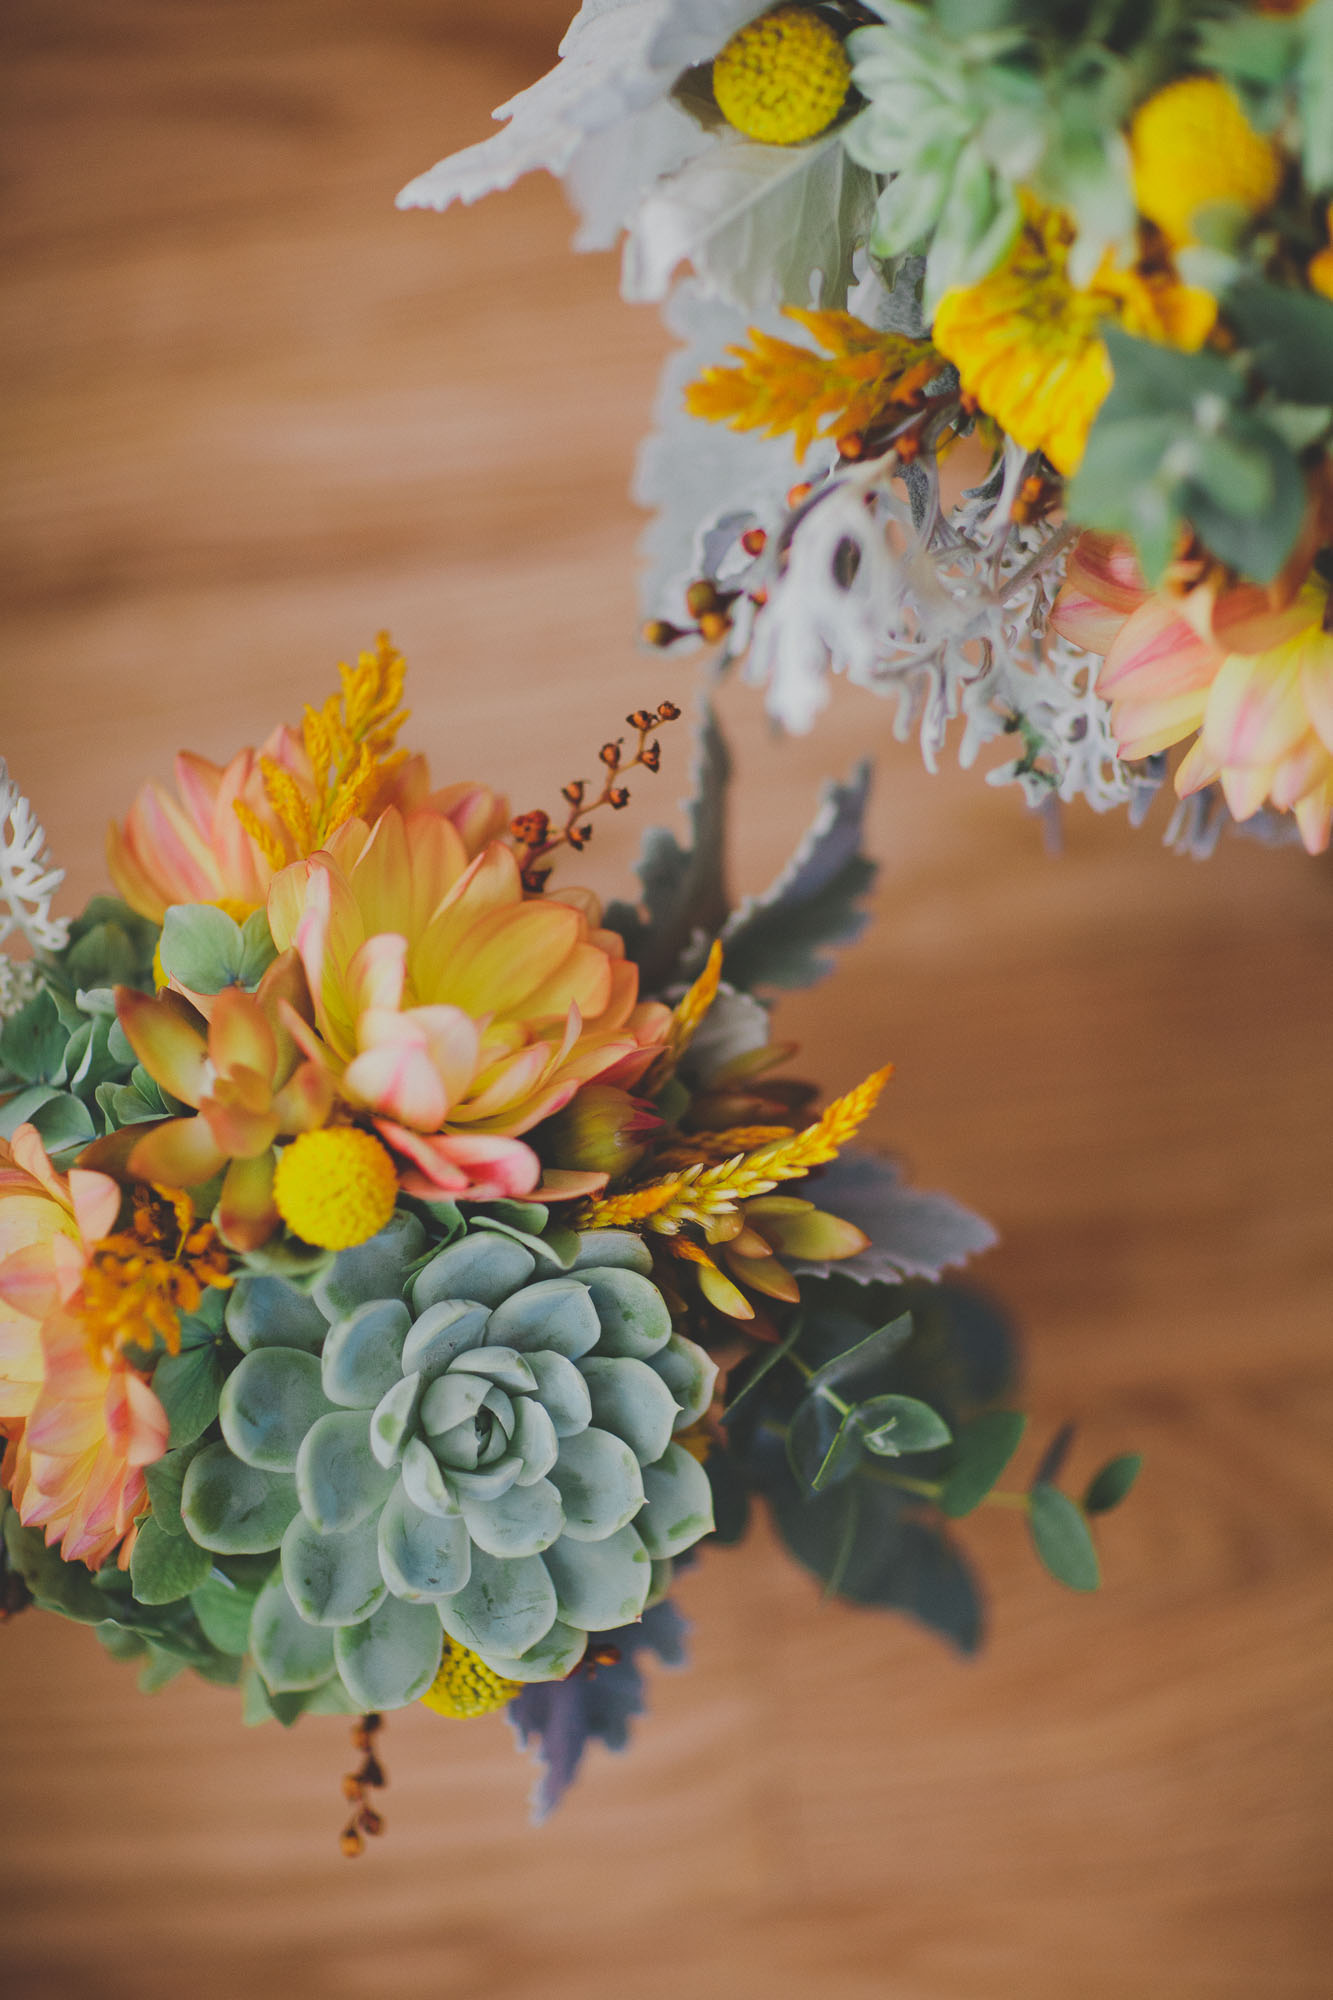 Gretchen_Gause_Petaluma_Olympias_Valley_Wedding_Photo-047.jpg